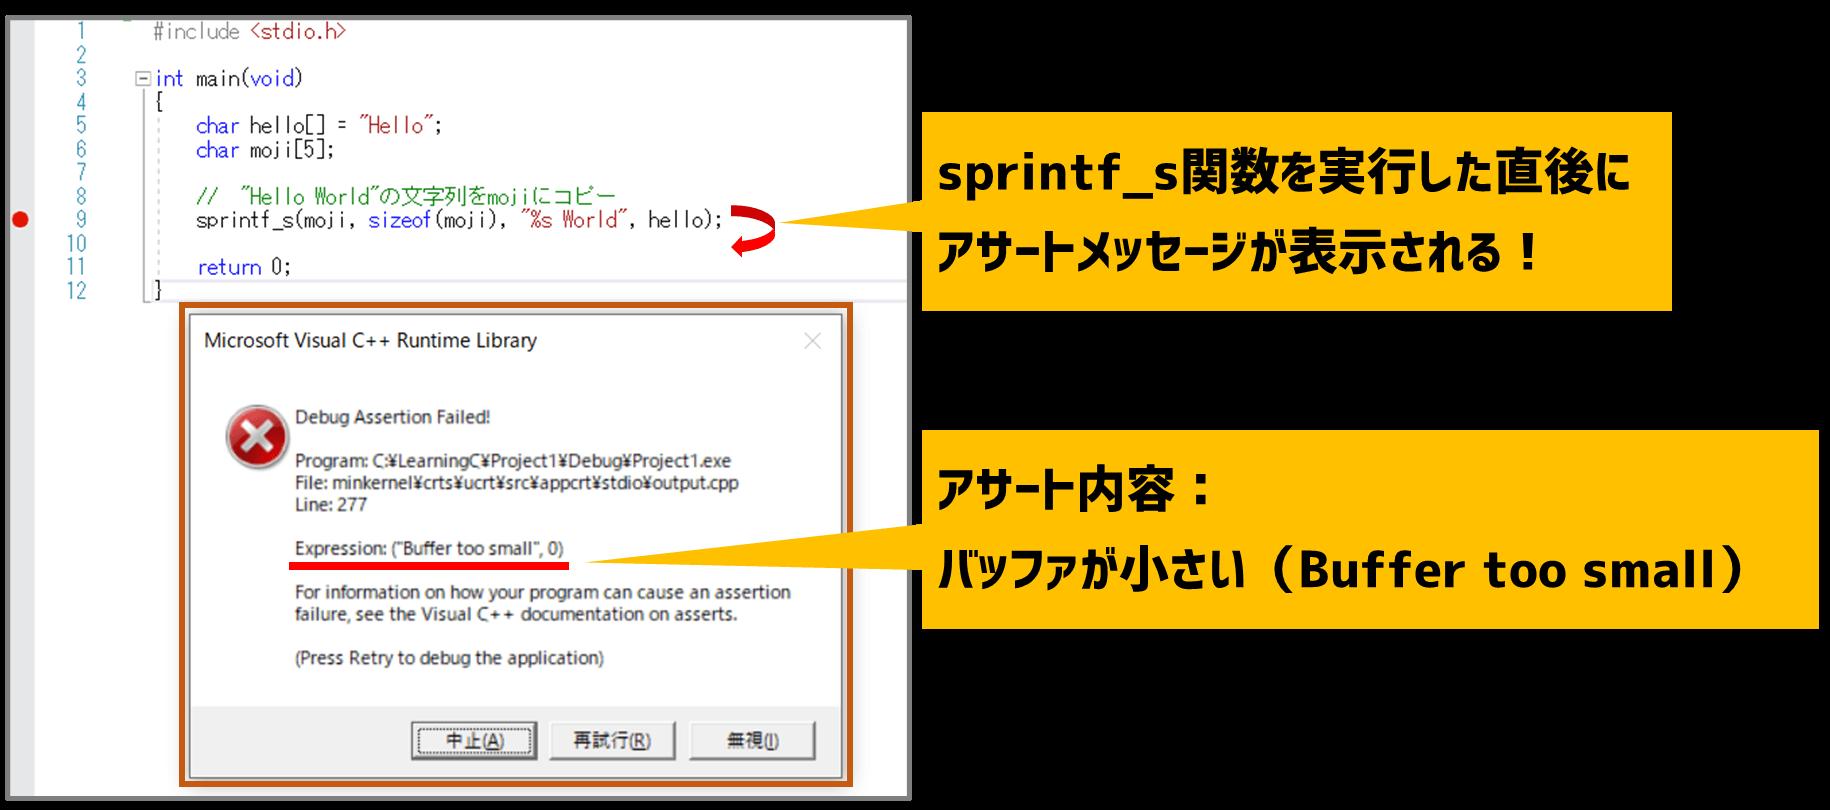 sprintf_sのアサート